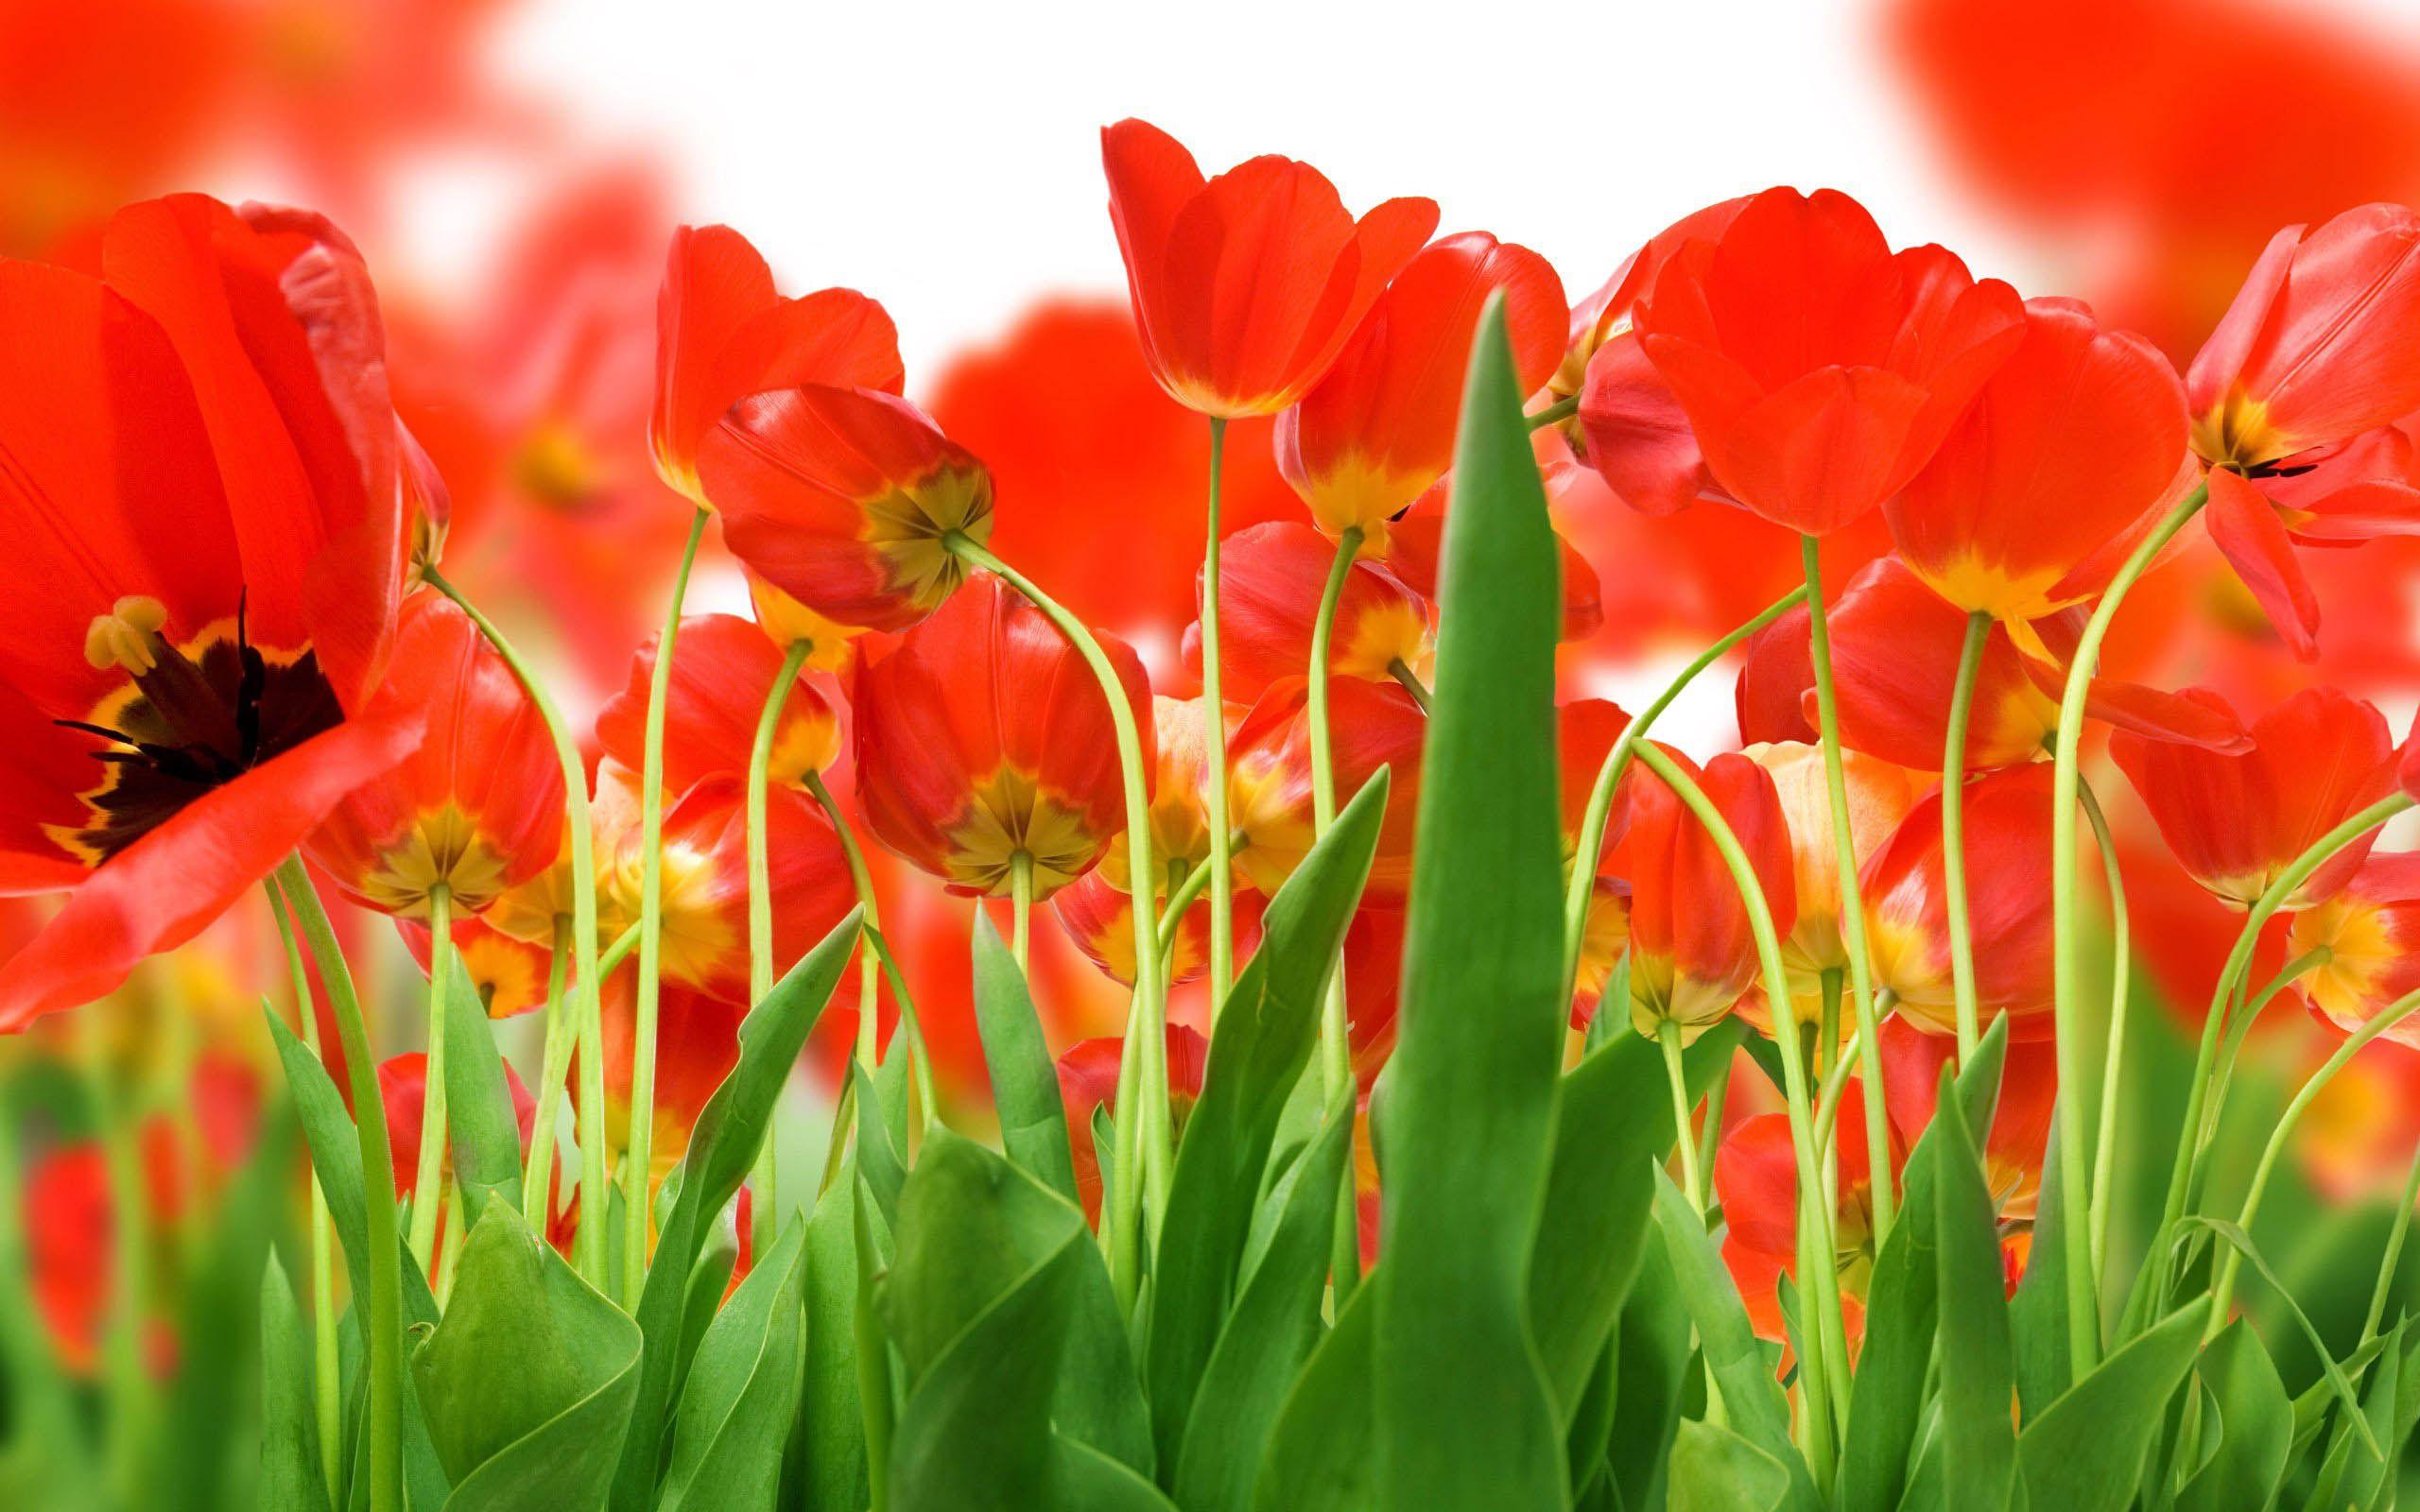 Awesome Flowers Wallpaper Desktop Background Full Screen Krasnye Tyulpany Krasnye Maki Tyulpany